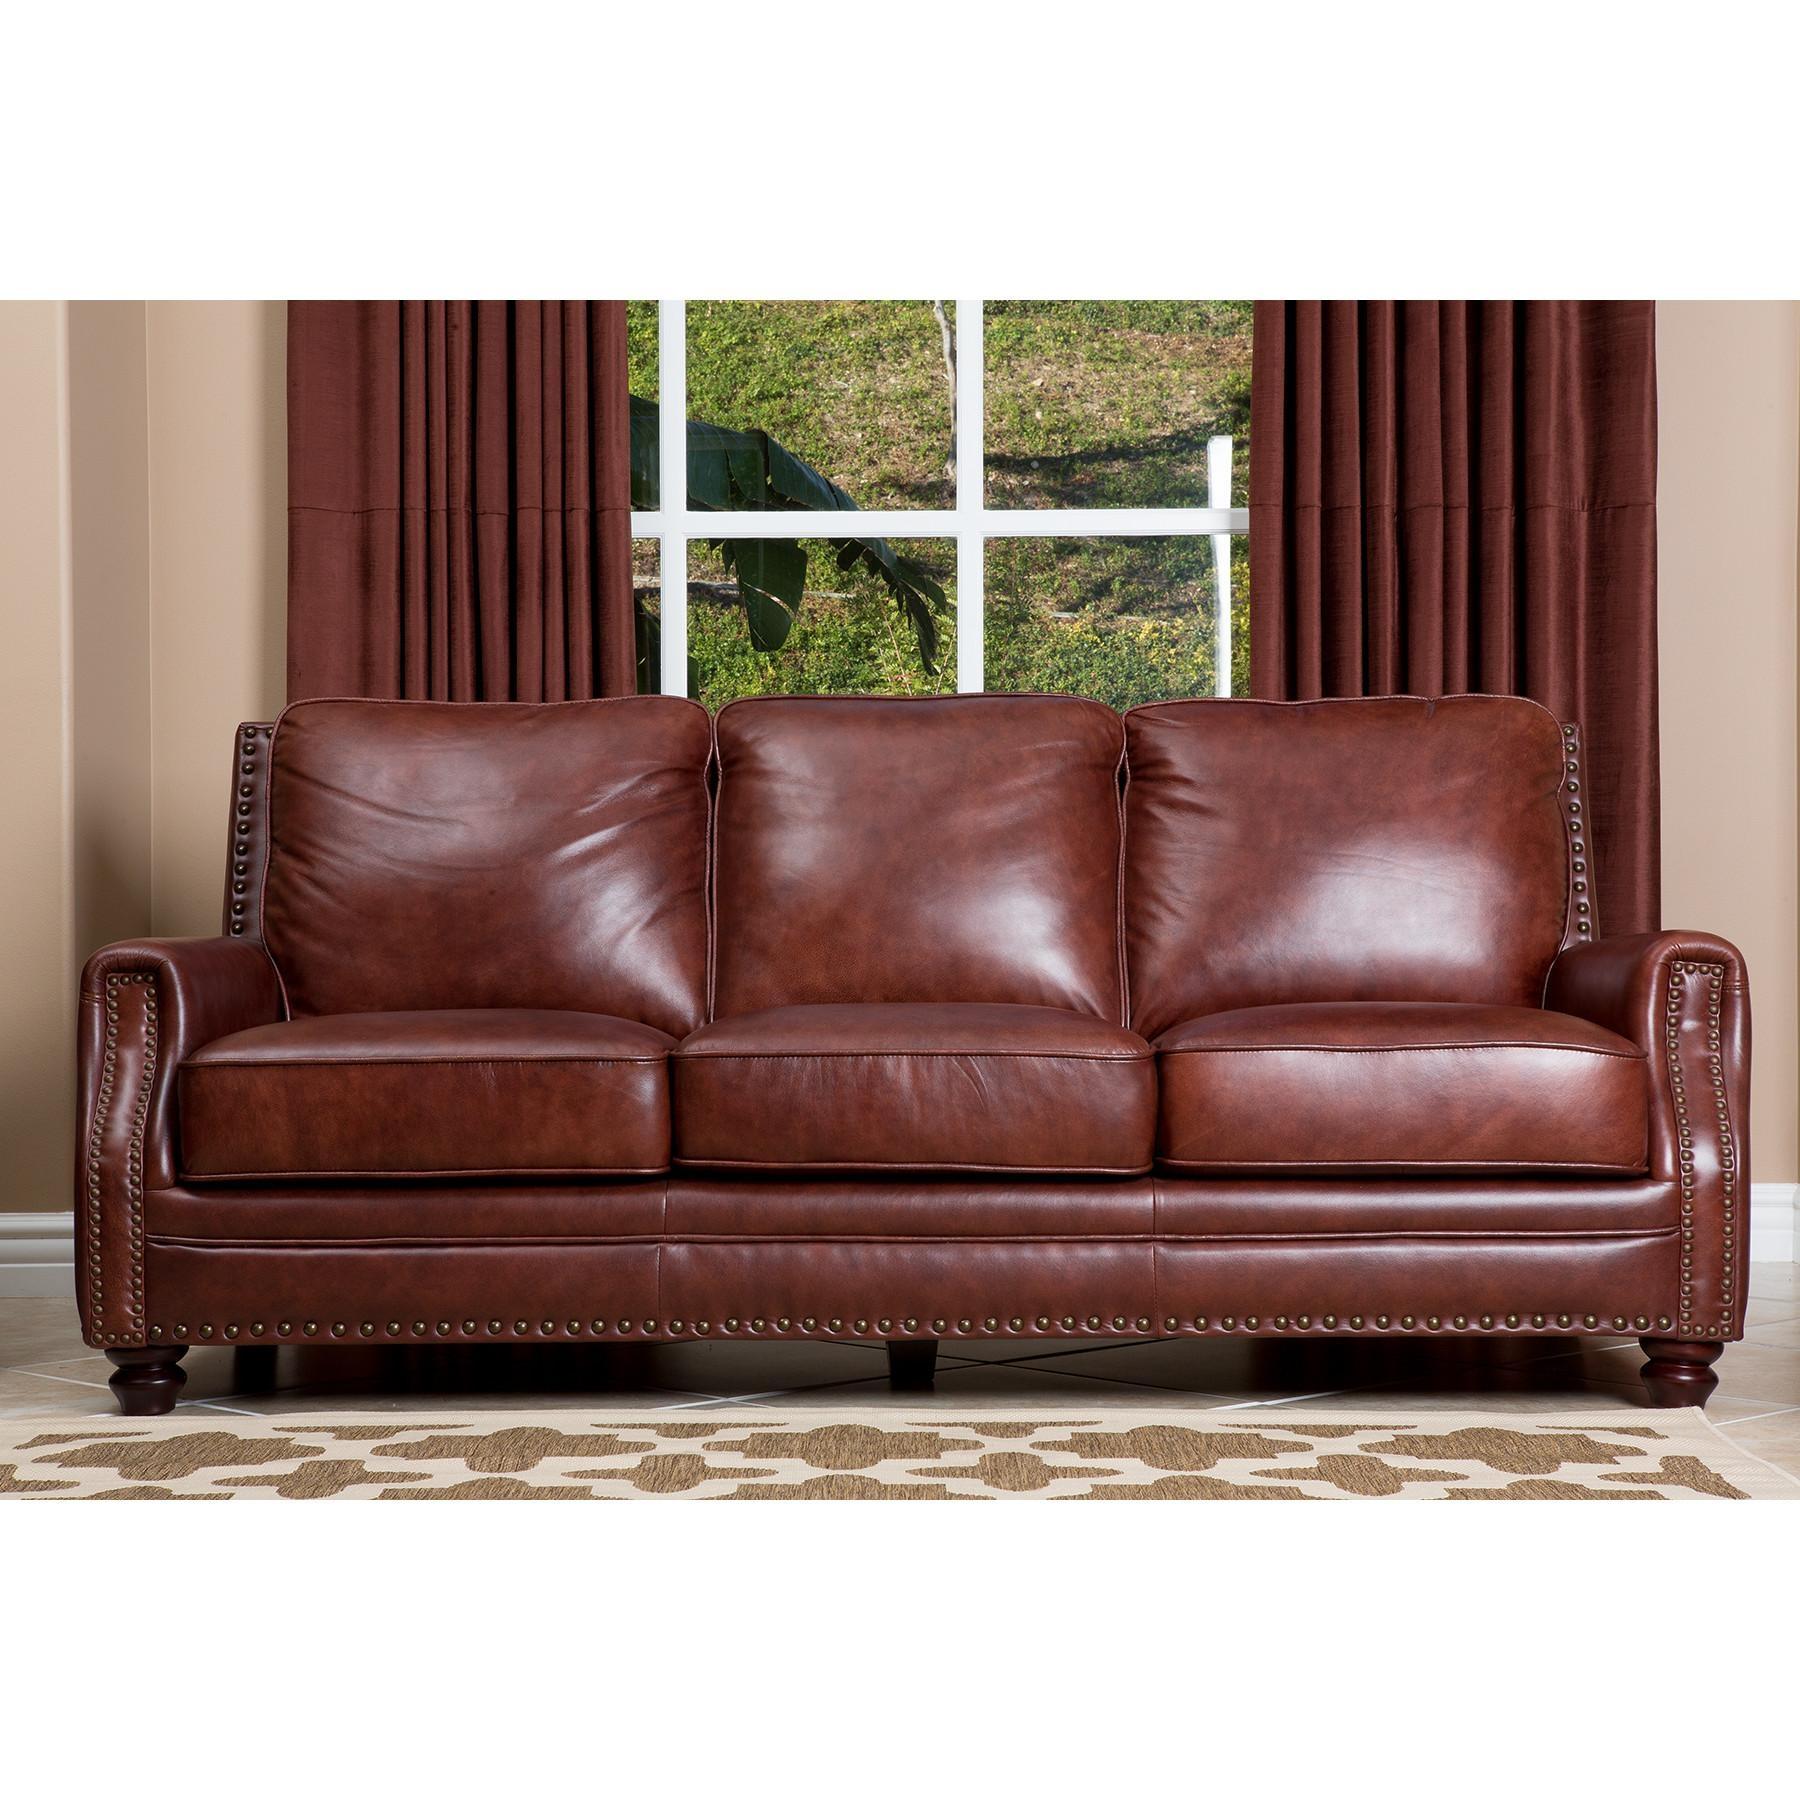 Abbyson Living Charlotte Beige Sectional Sofa And Ottoman   Sofa Regarding Abbyson Living Sofas (View 14 of 20)